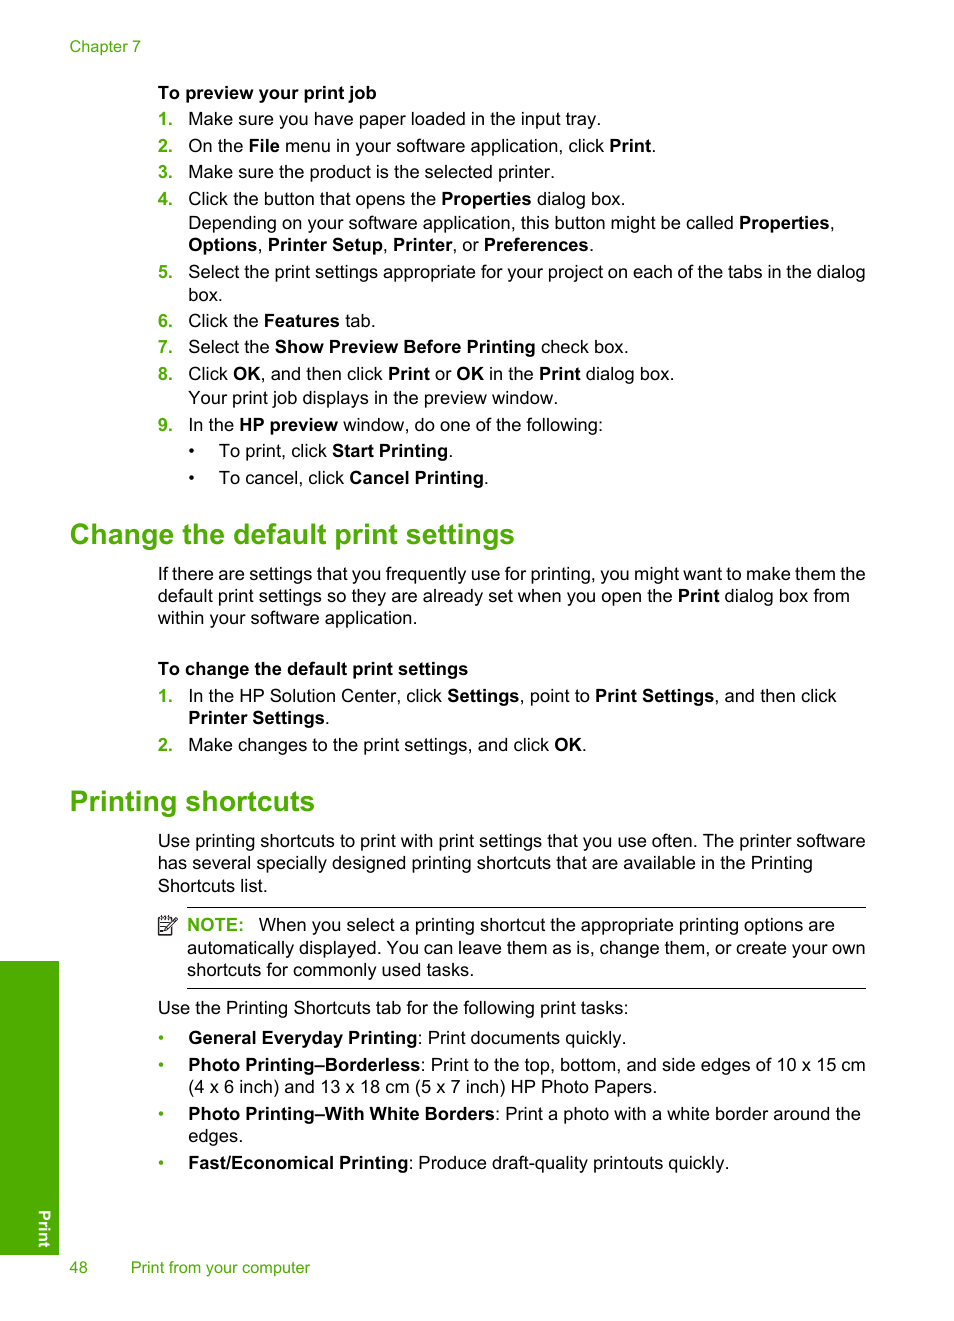 Change the default print settings, Printing shortcuts | HP